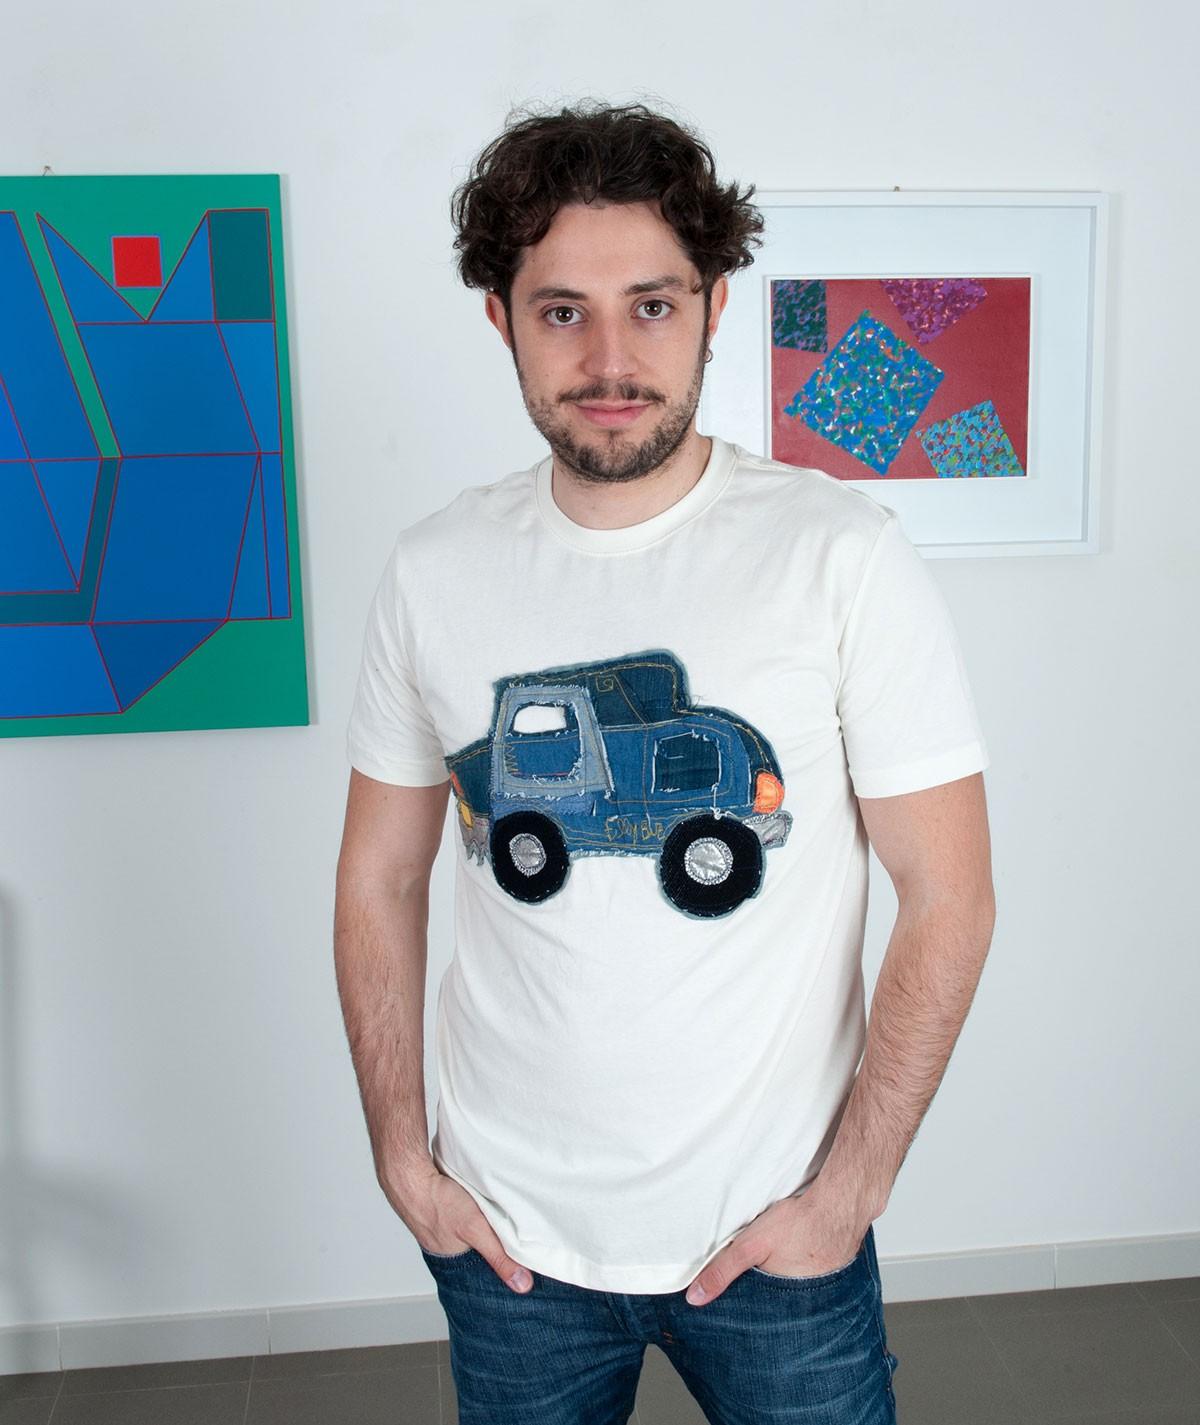 T-shirt con macchinina